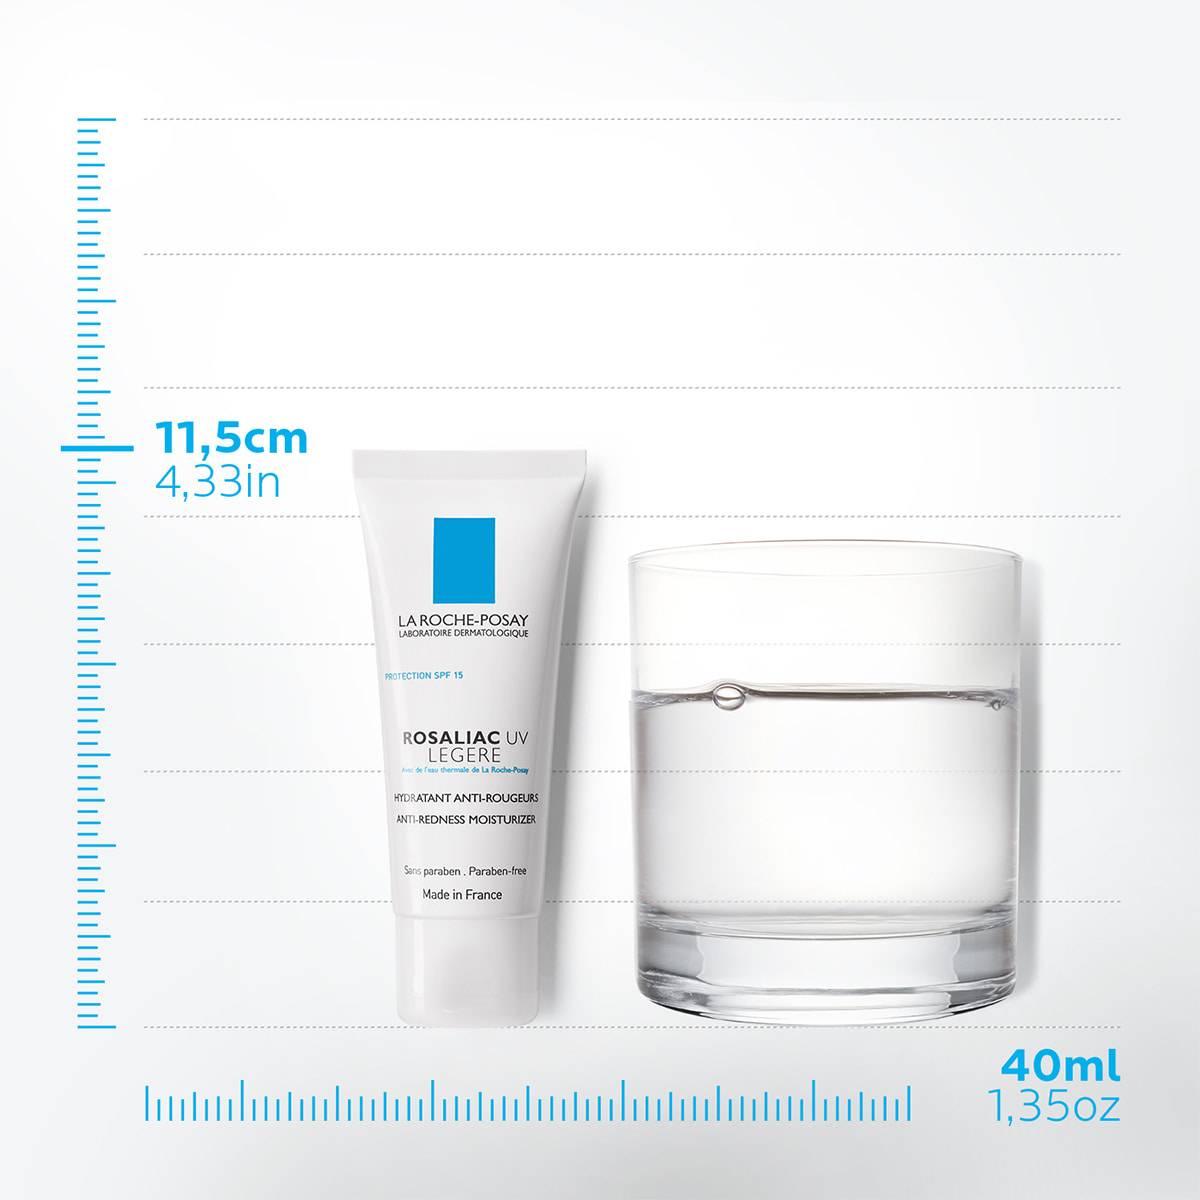 La Roche Posay ProductPage Face Care Rosaliac UV Light Spf15 40ml 3337